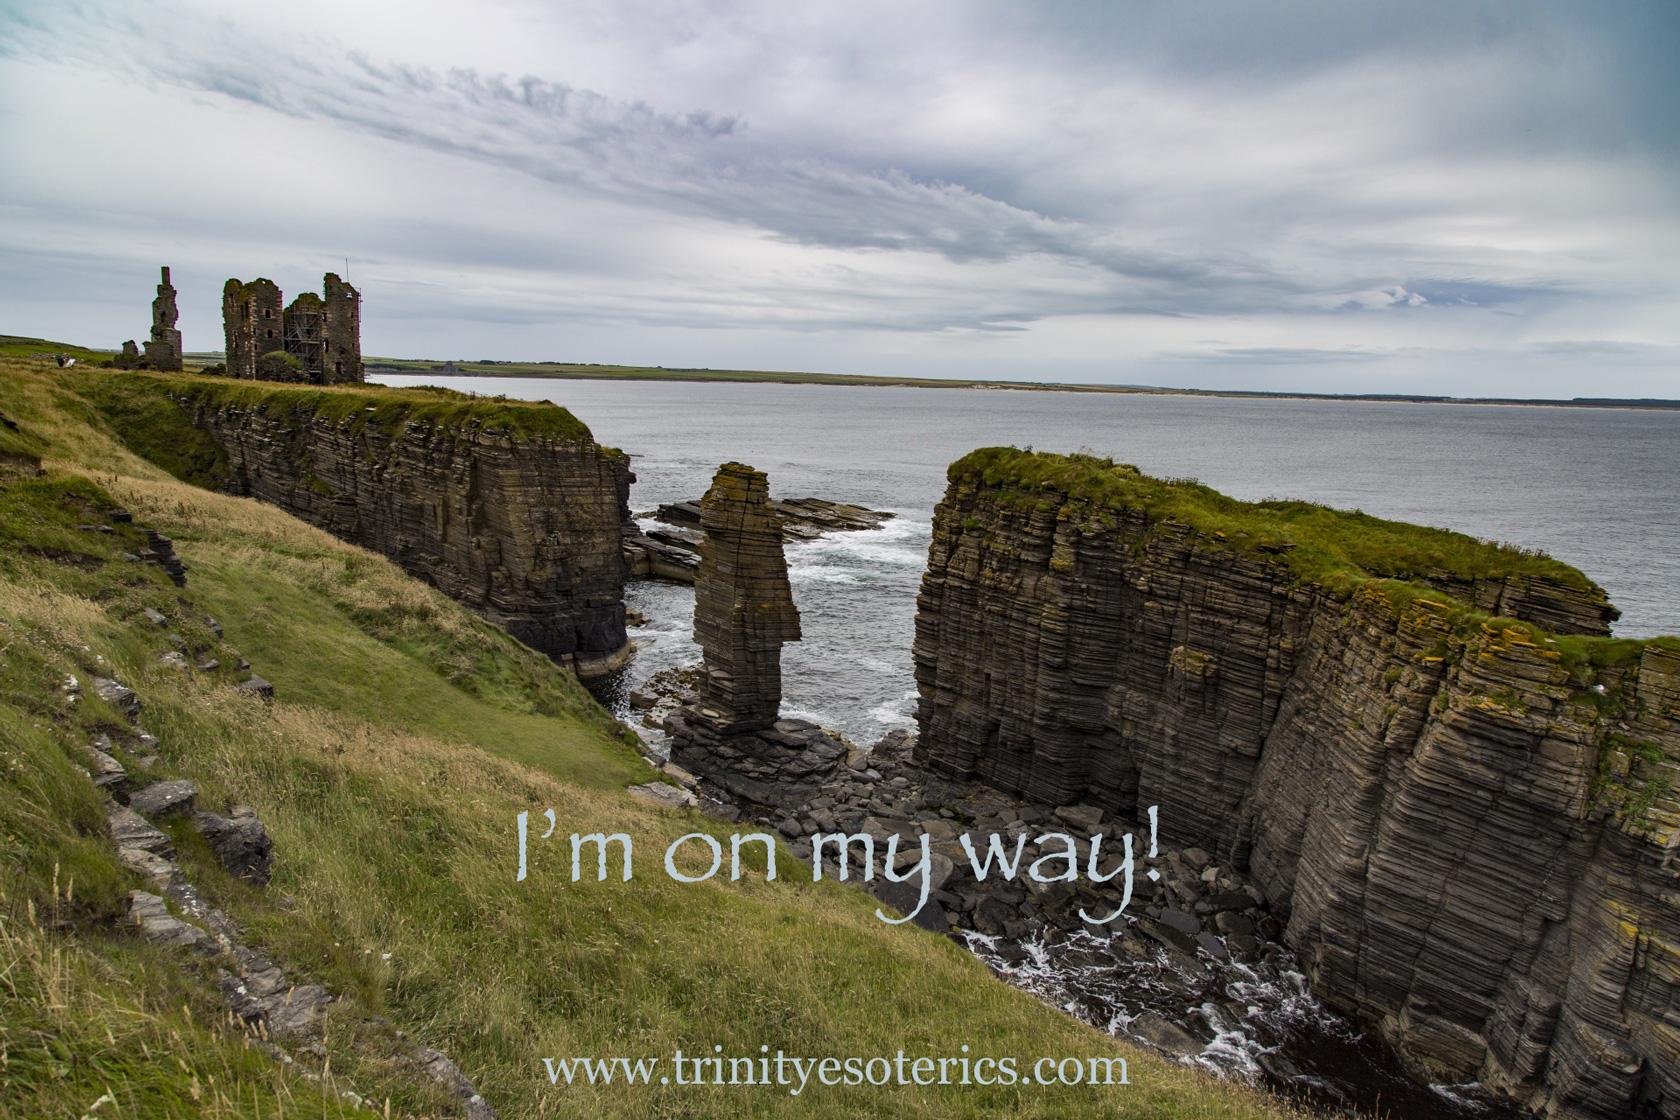 scotland coastline trinity esoterics